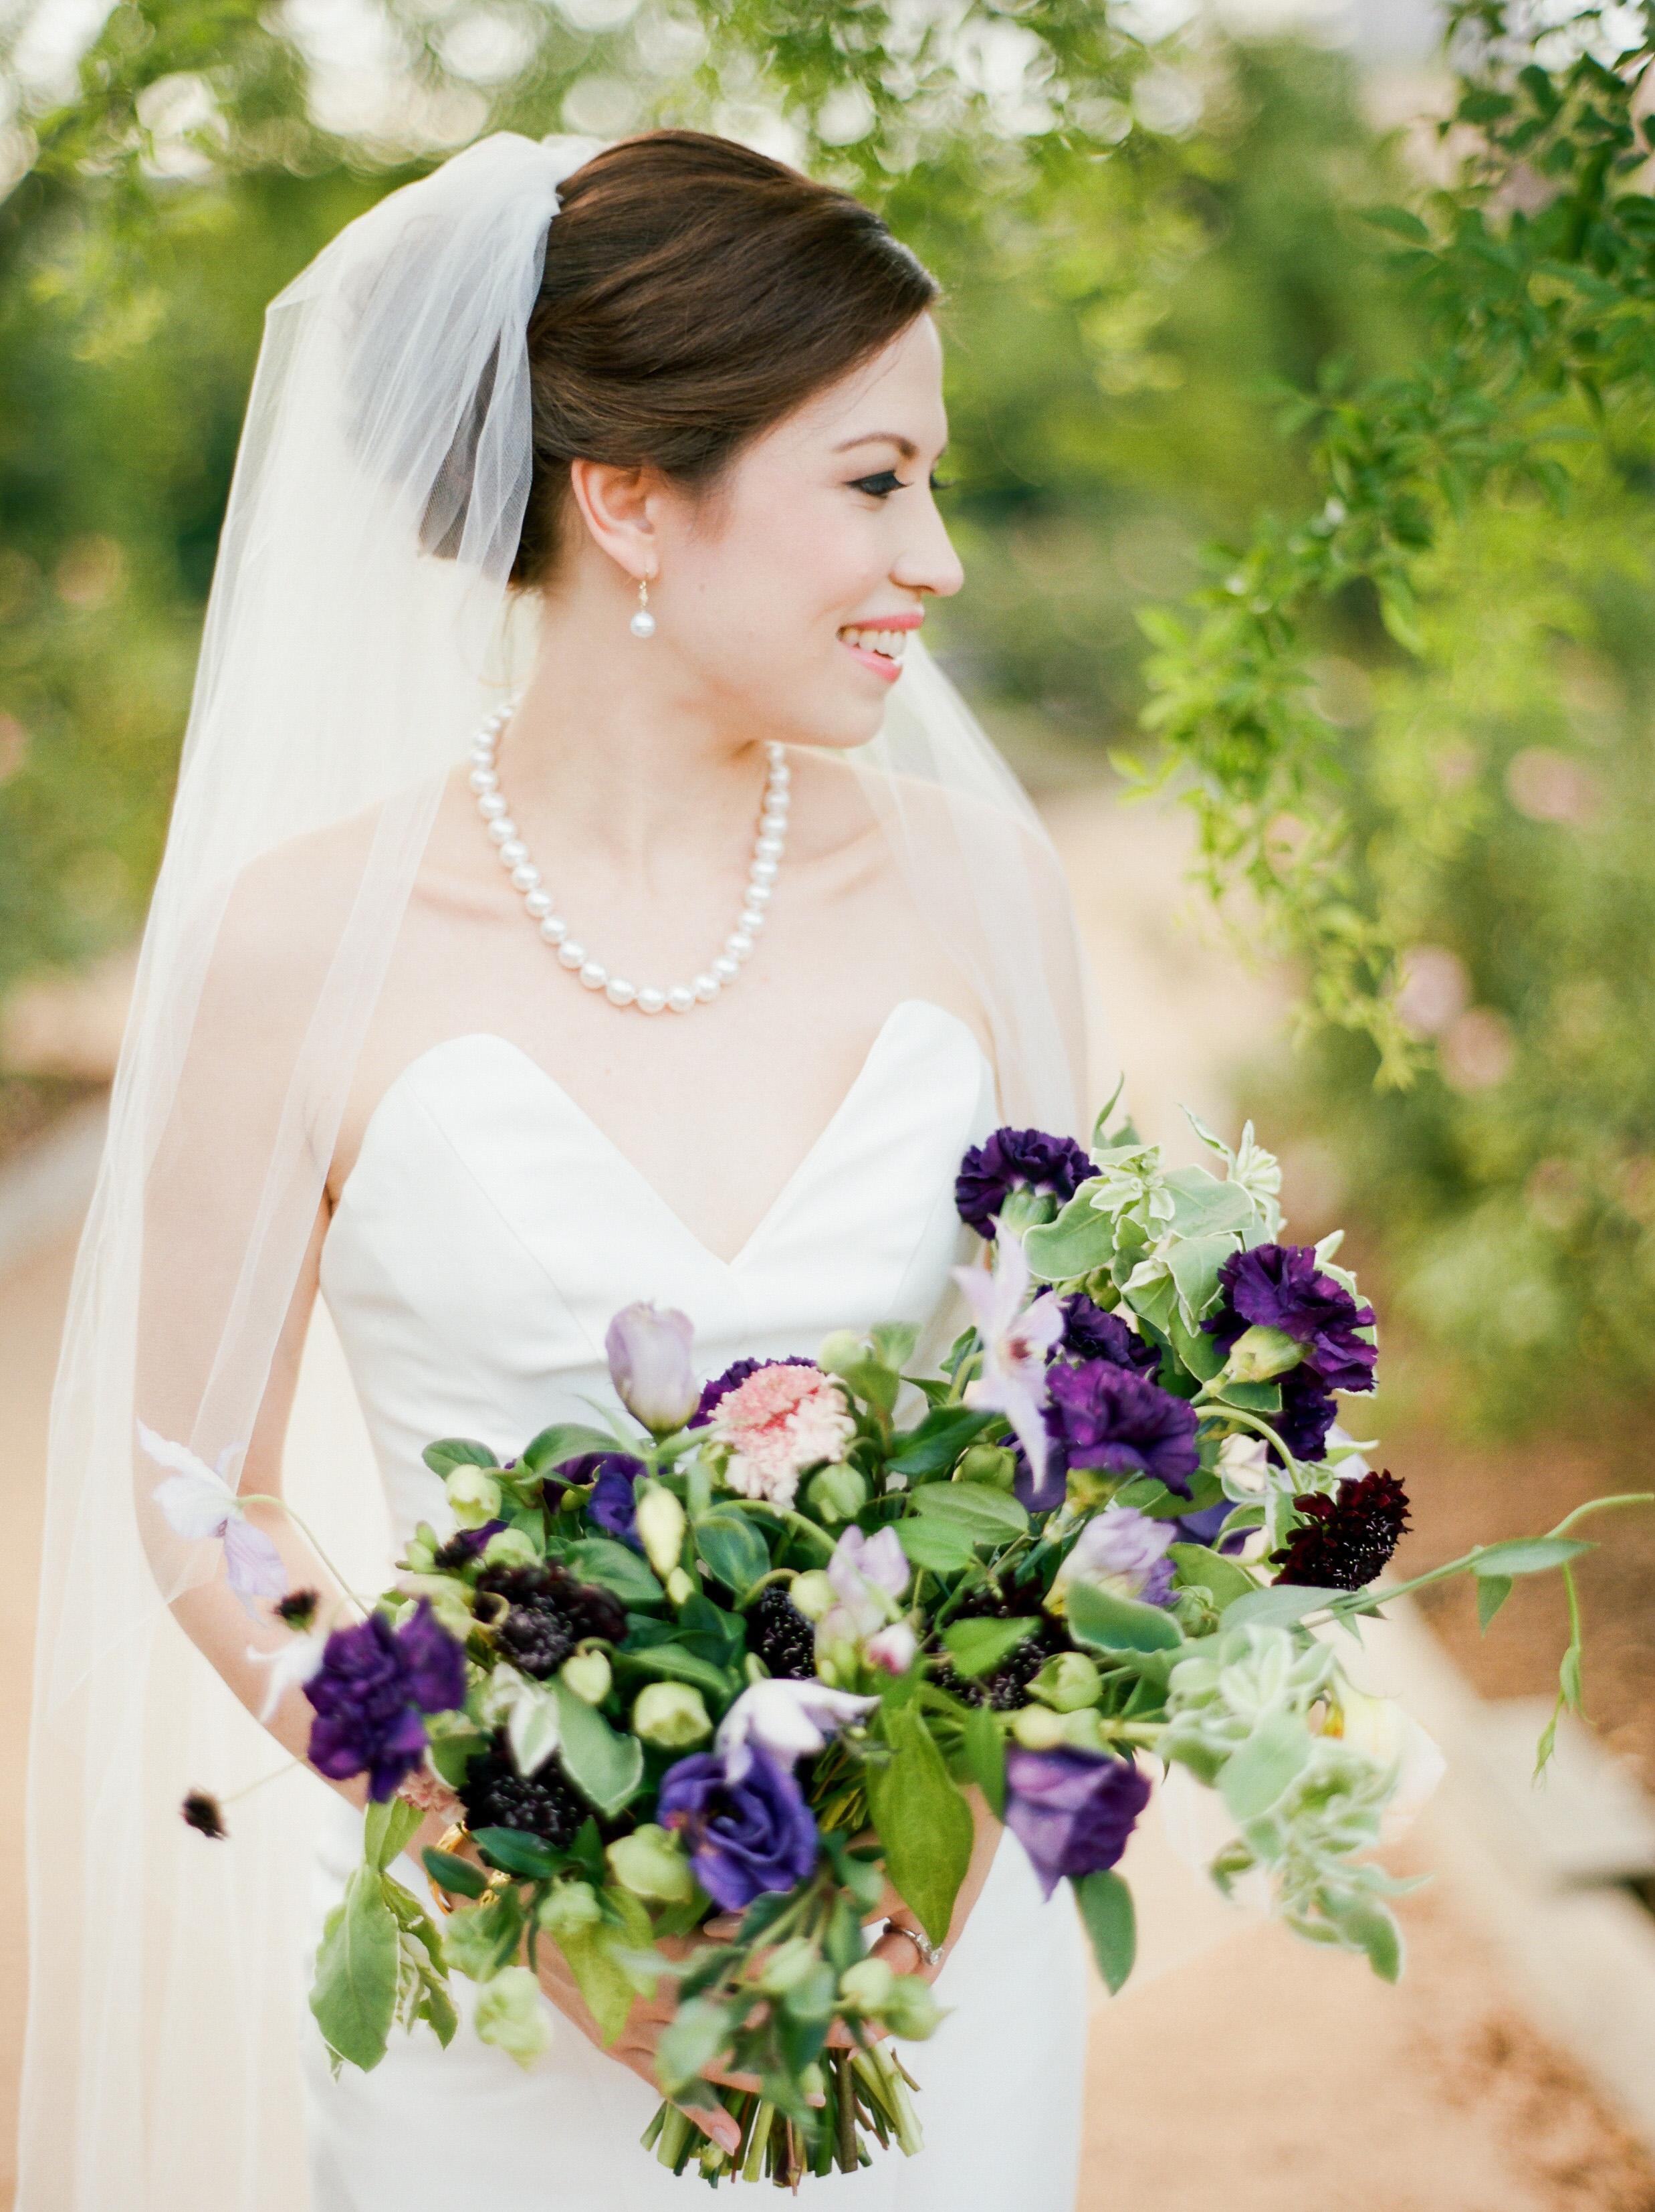 mcgovern-centennial-gardens-wedding-houston-wedding-photographer-bridals-film-austin-wedding-photographer-7.jpg